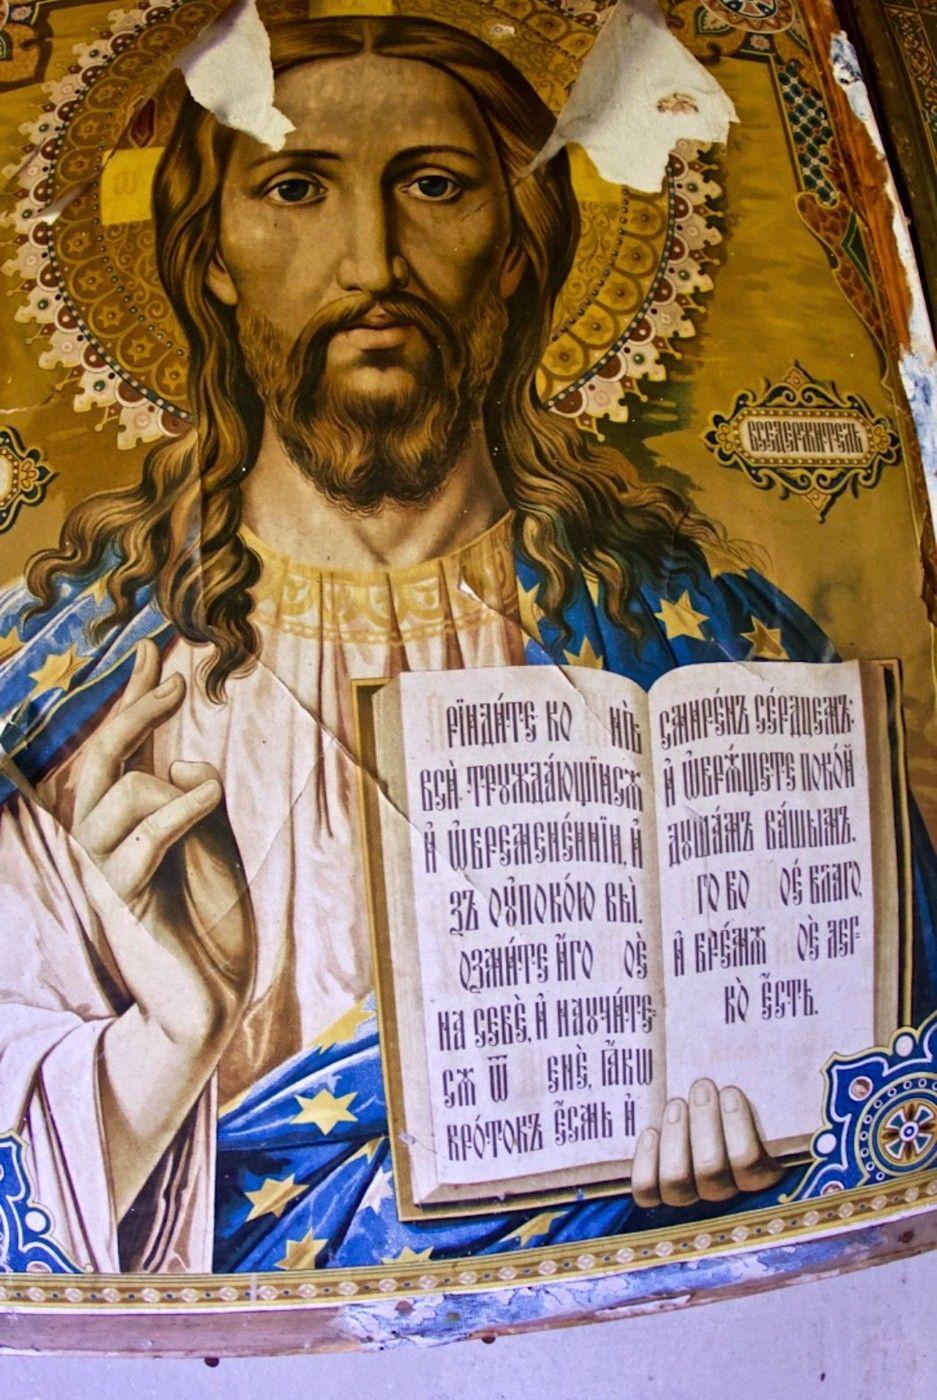 The Savior speaks Russian, too.